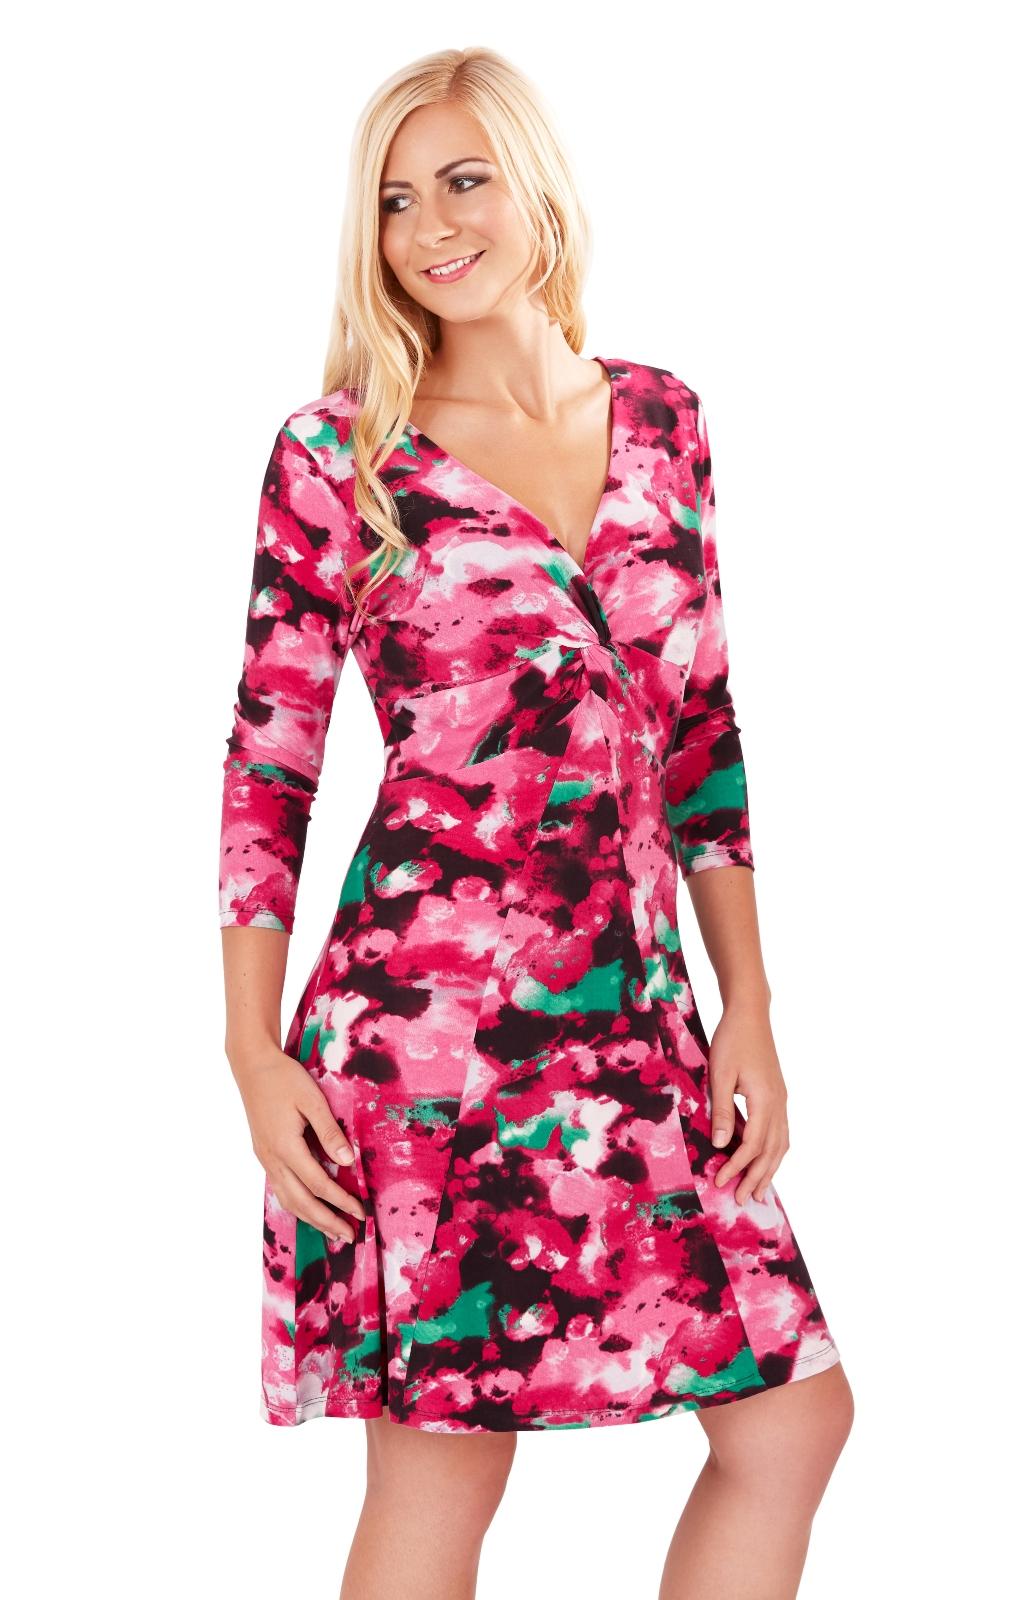 Z Cite womens grey sundress with long sleeve jacket glamour pattern size L.